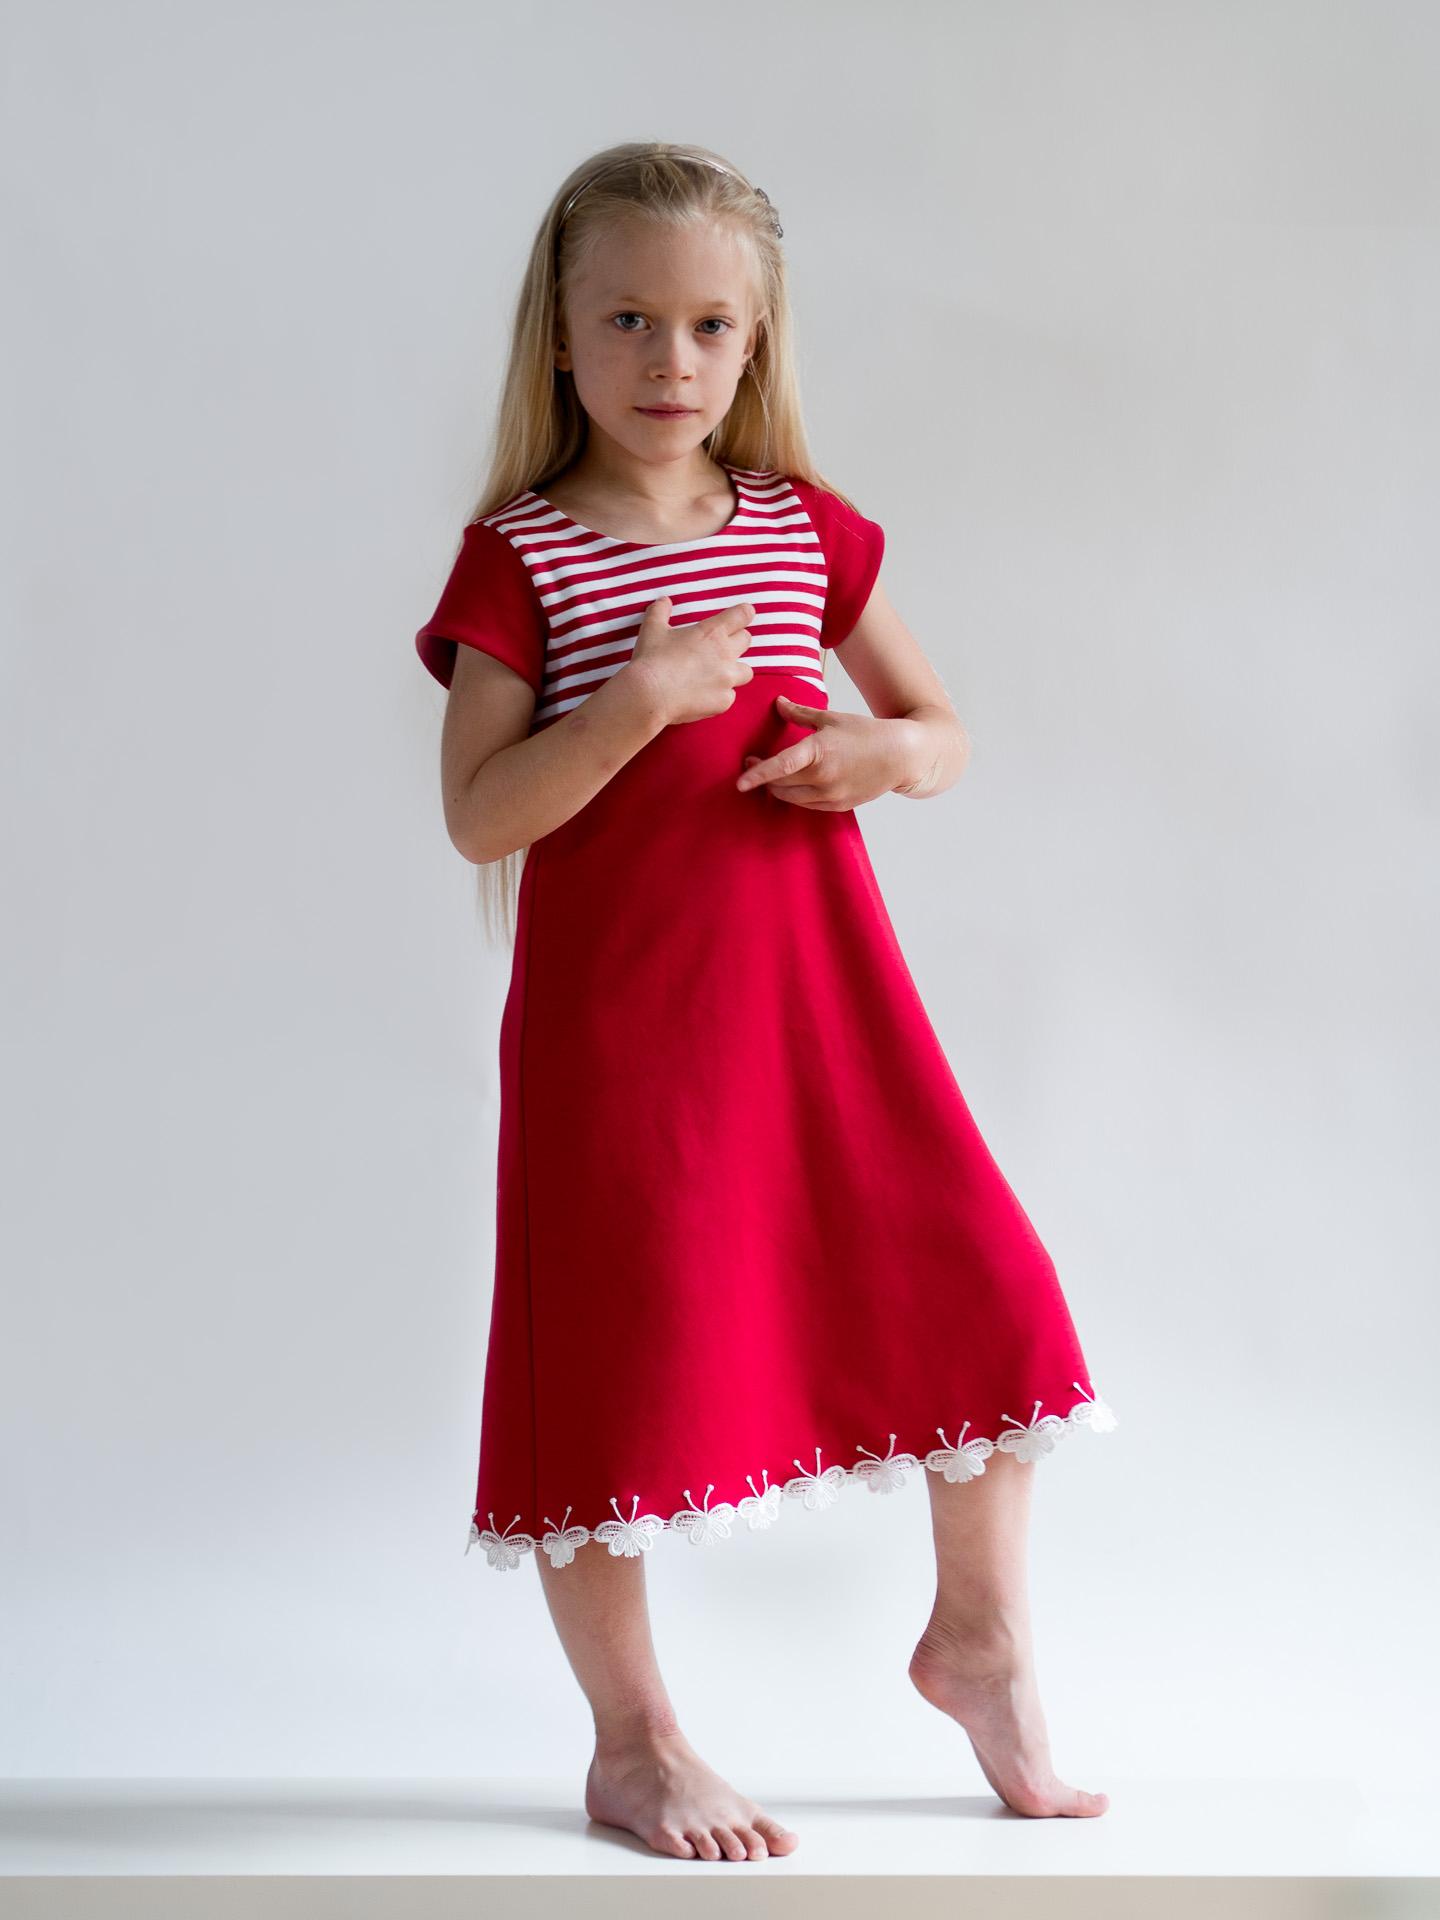 Tøj Rød – Og Drenge Med Piger Kjole Til Sommerfugle rqq7n6Ix